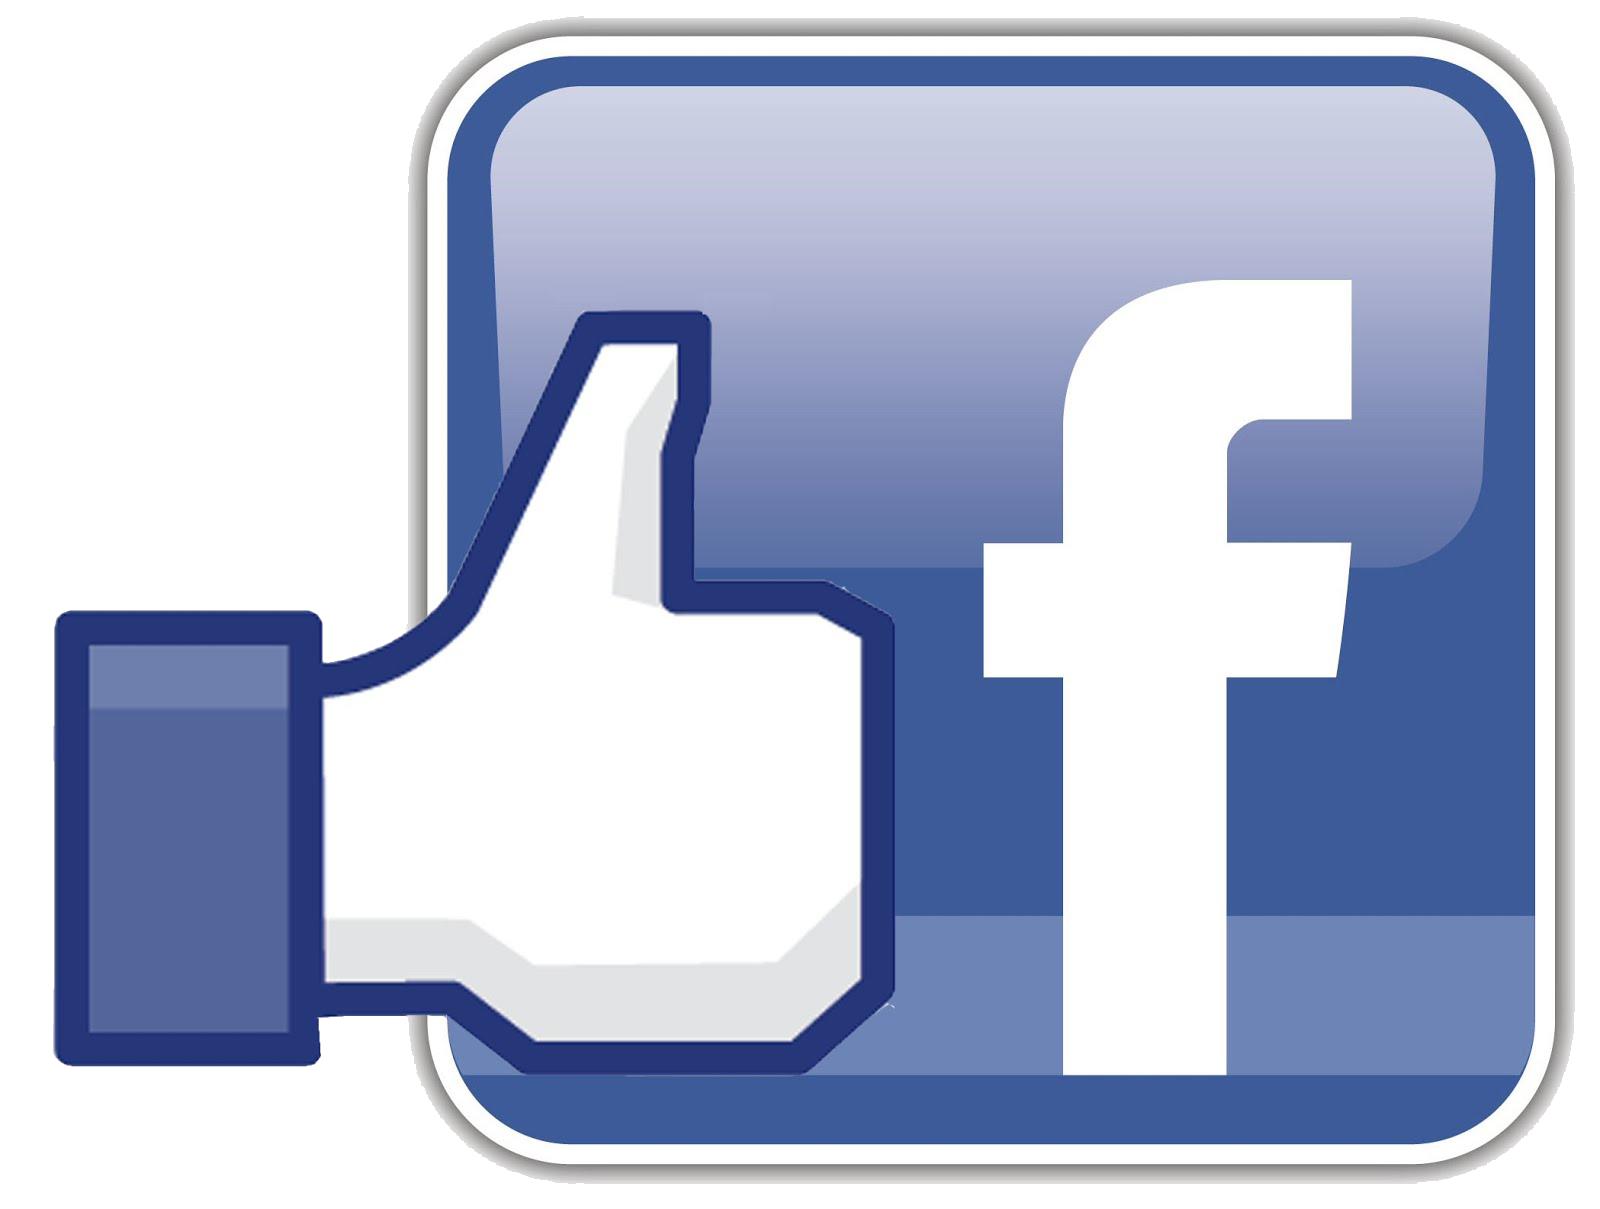 Veleslava na Facebooku